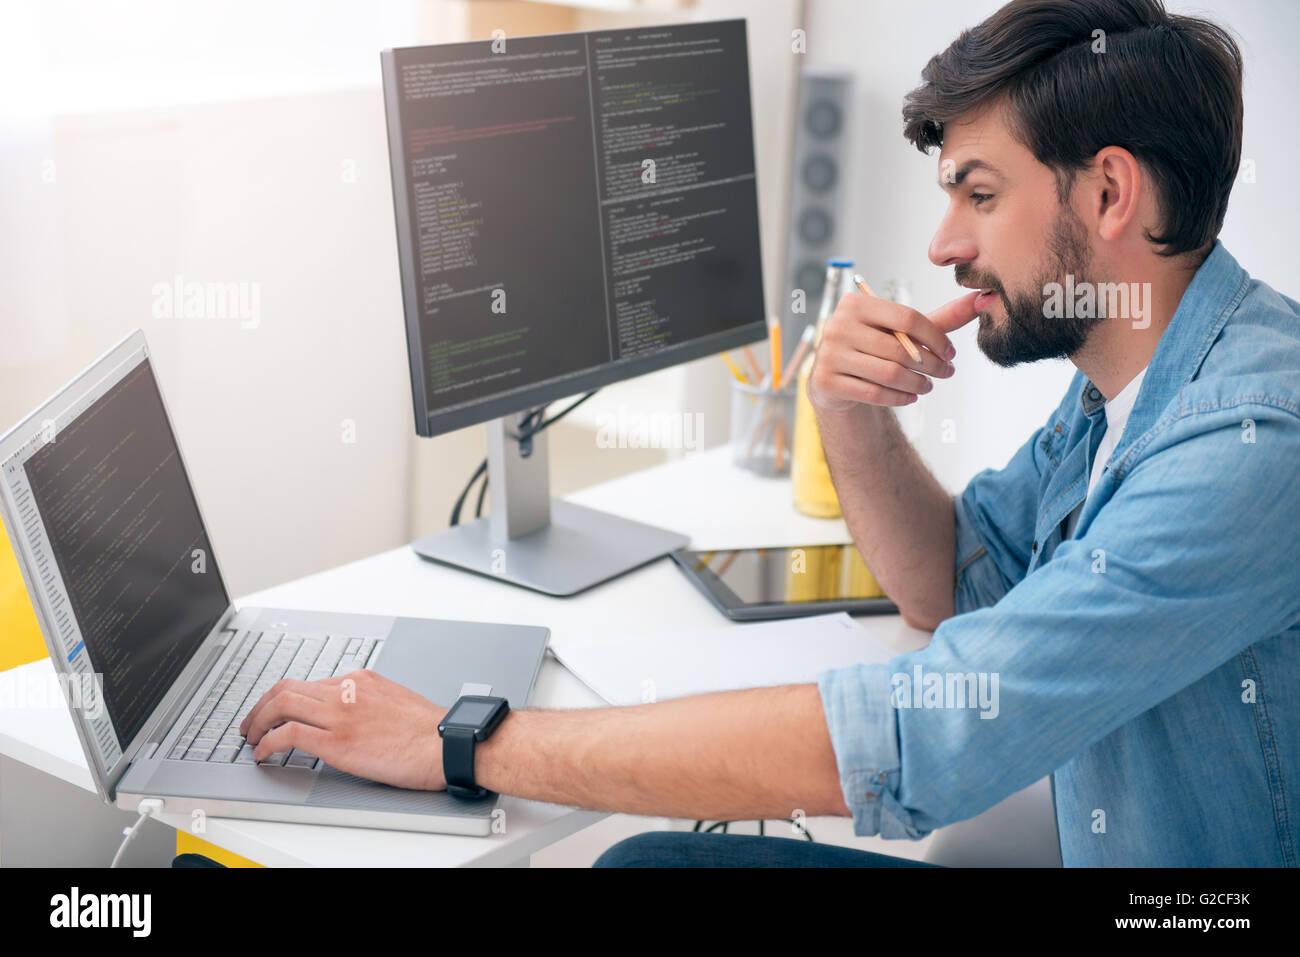 Man working on his laptop - Stock Image